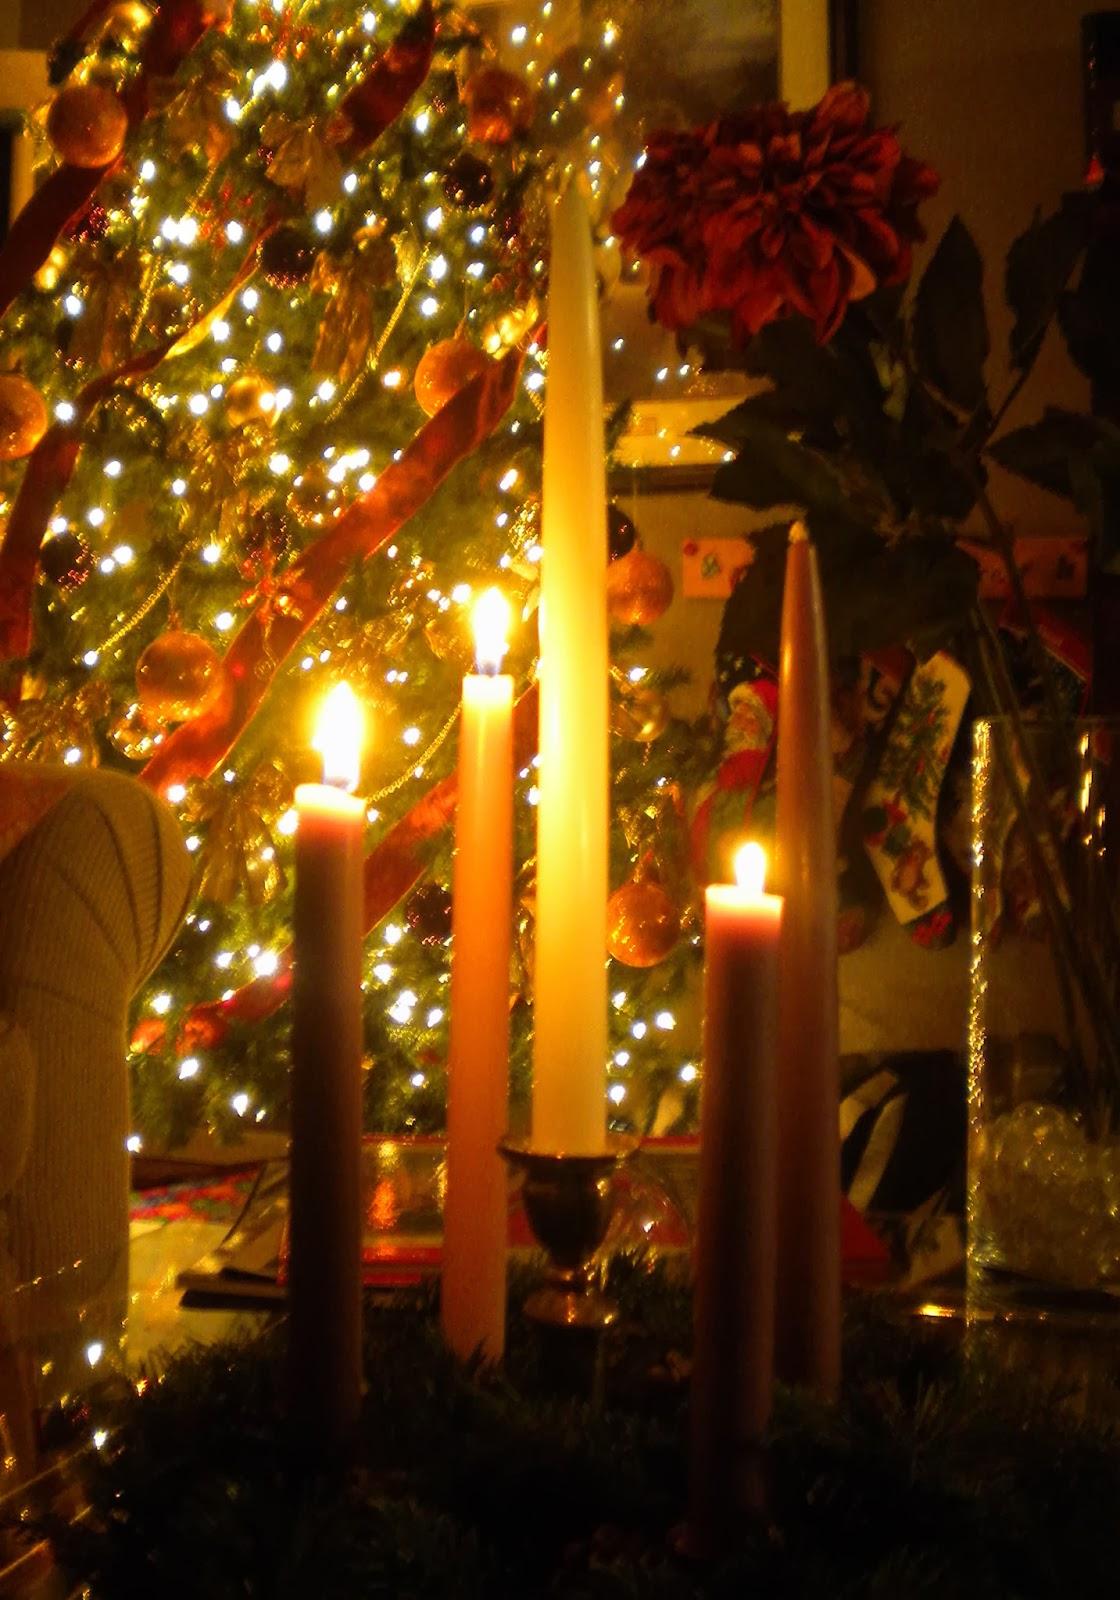 lds seasonal materials third advent joy. Black Bedroom Furniture Sets. Home Design Ideas